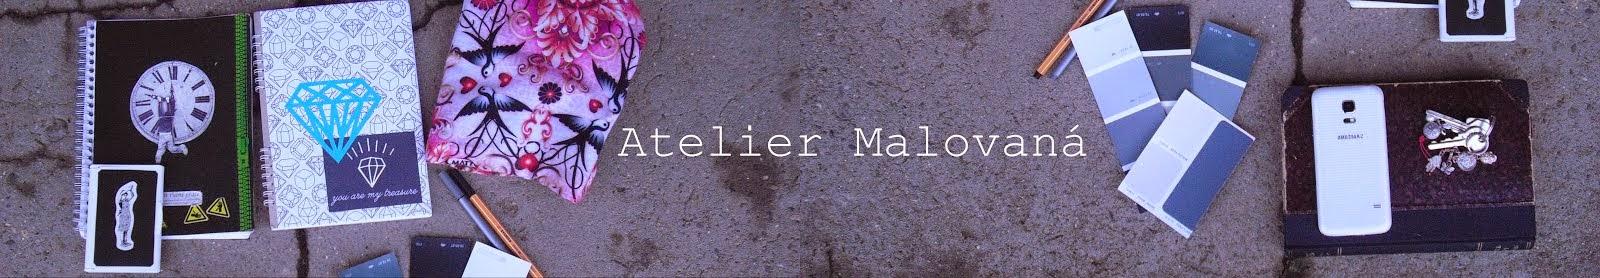 Atelier Malovaná